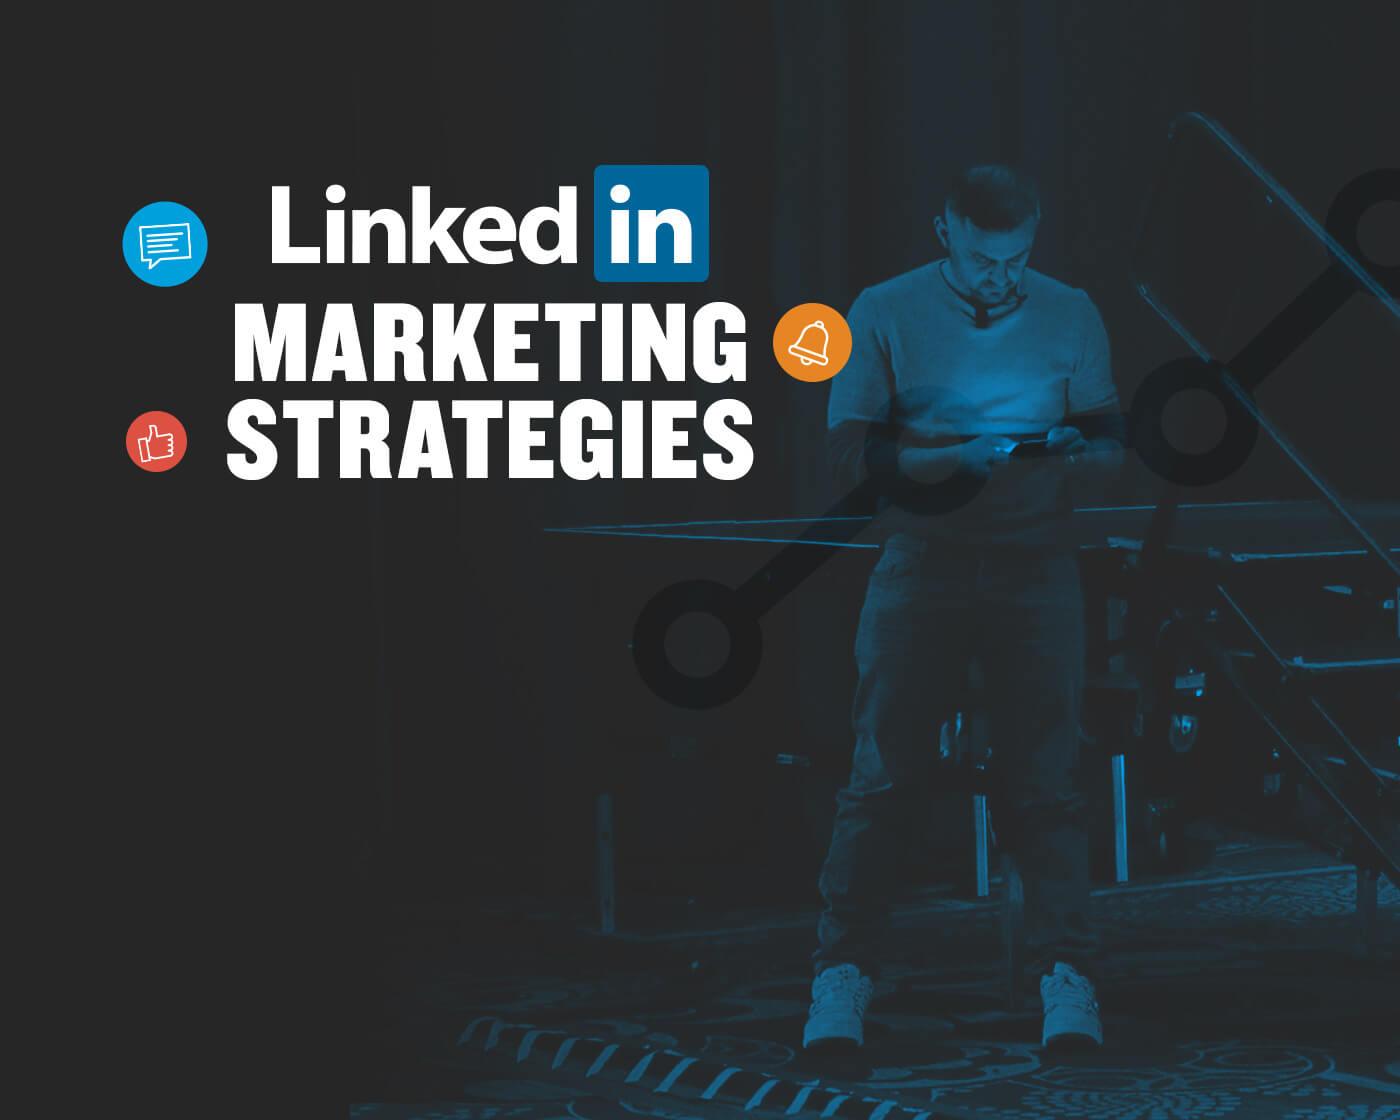 5 LinkedIn Marketing Strategies for 2019 | GaryVaynerchuk com